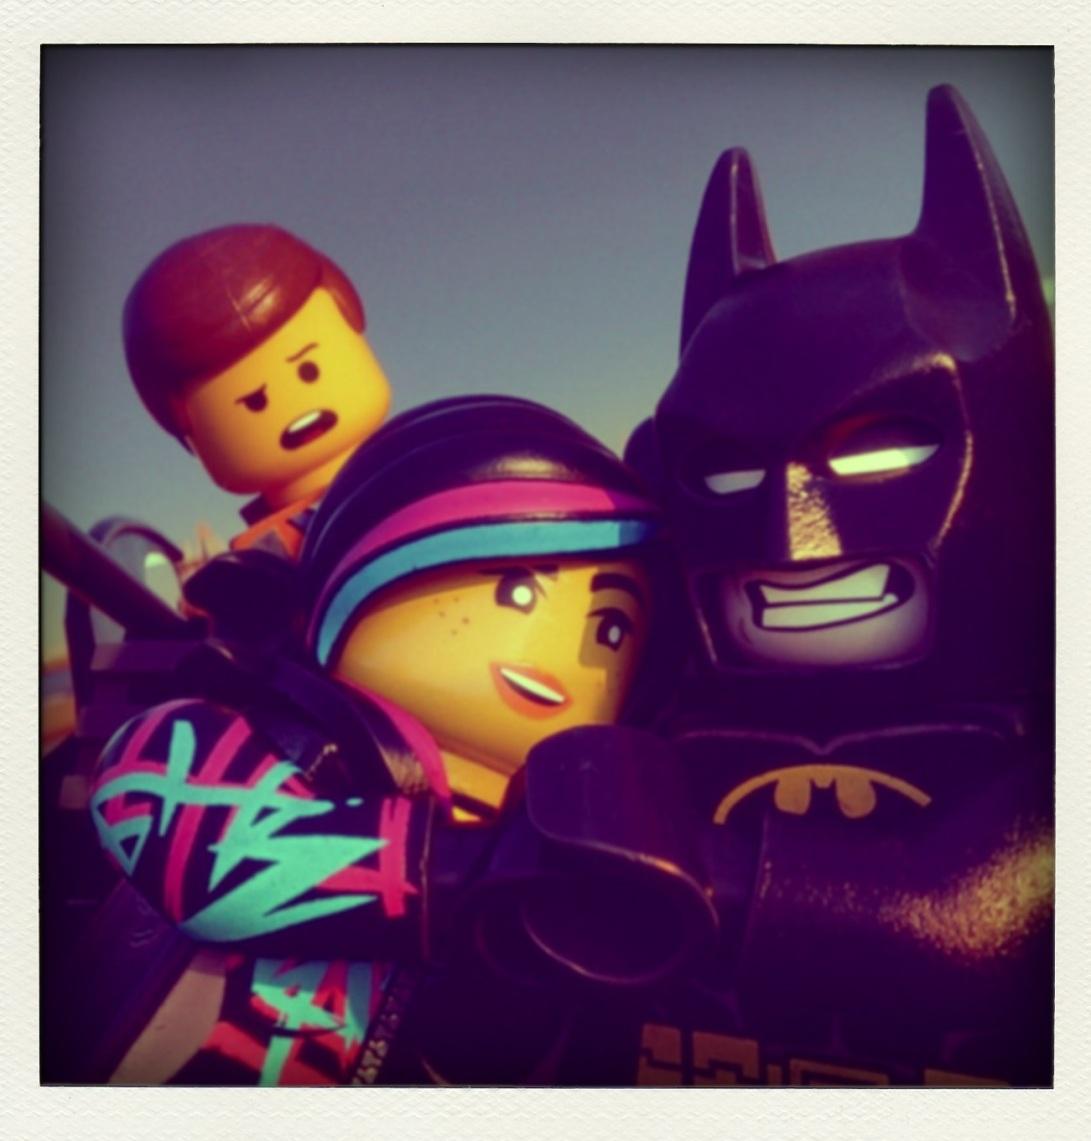 The Lego Movie @ www.cinemascream.co.uk